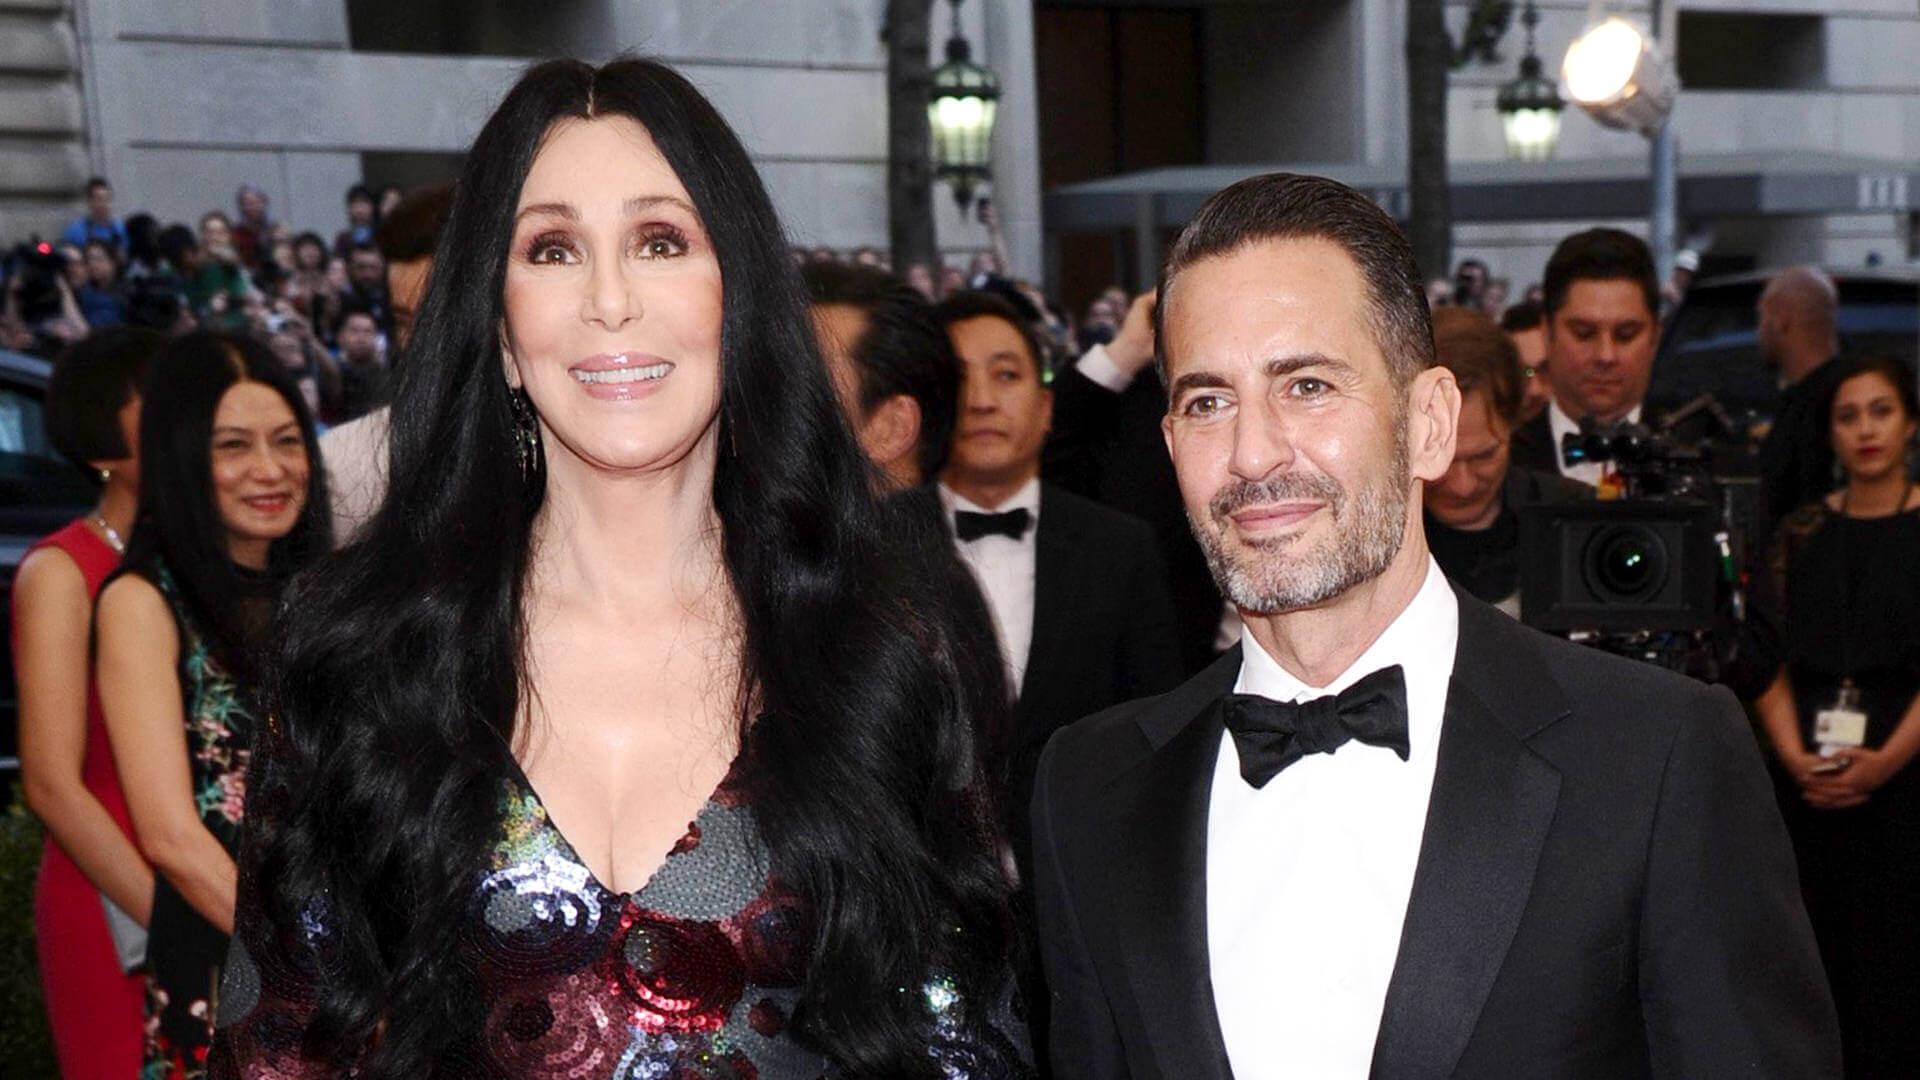 Image: Cher, left, Marc Jacobs